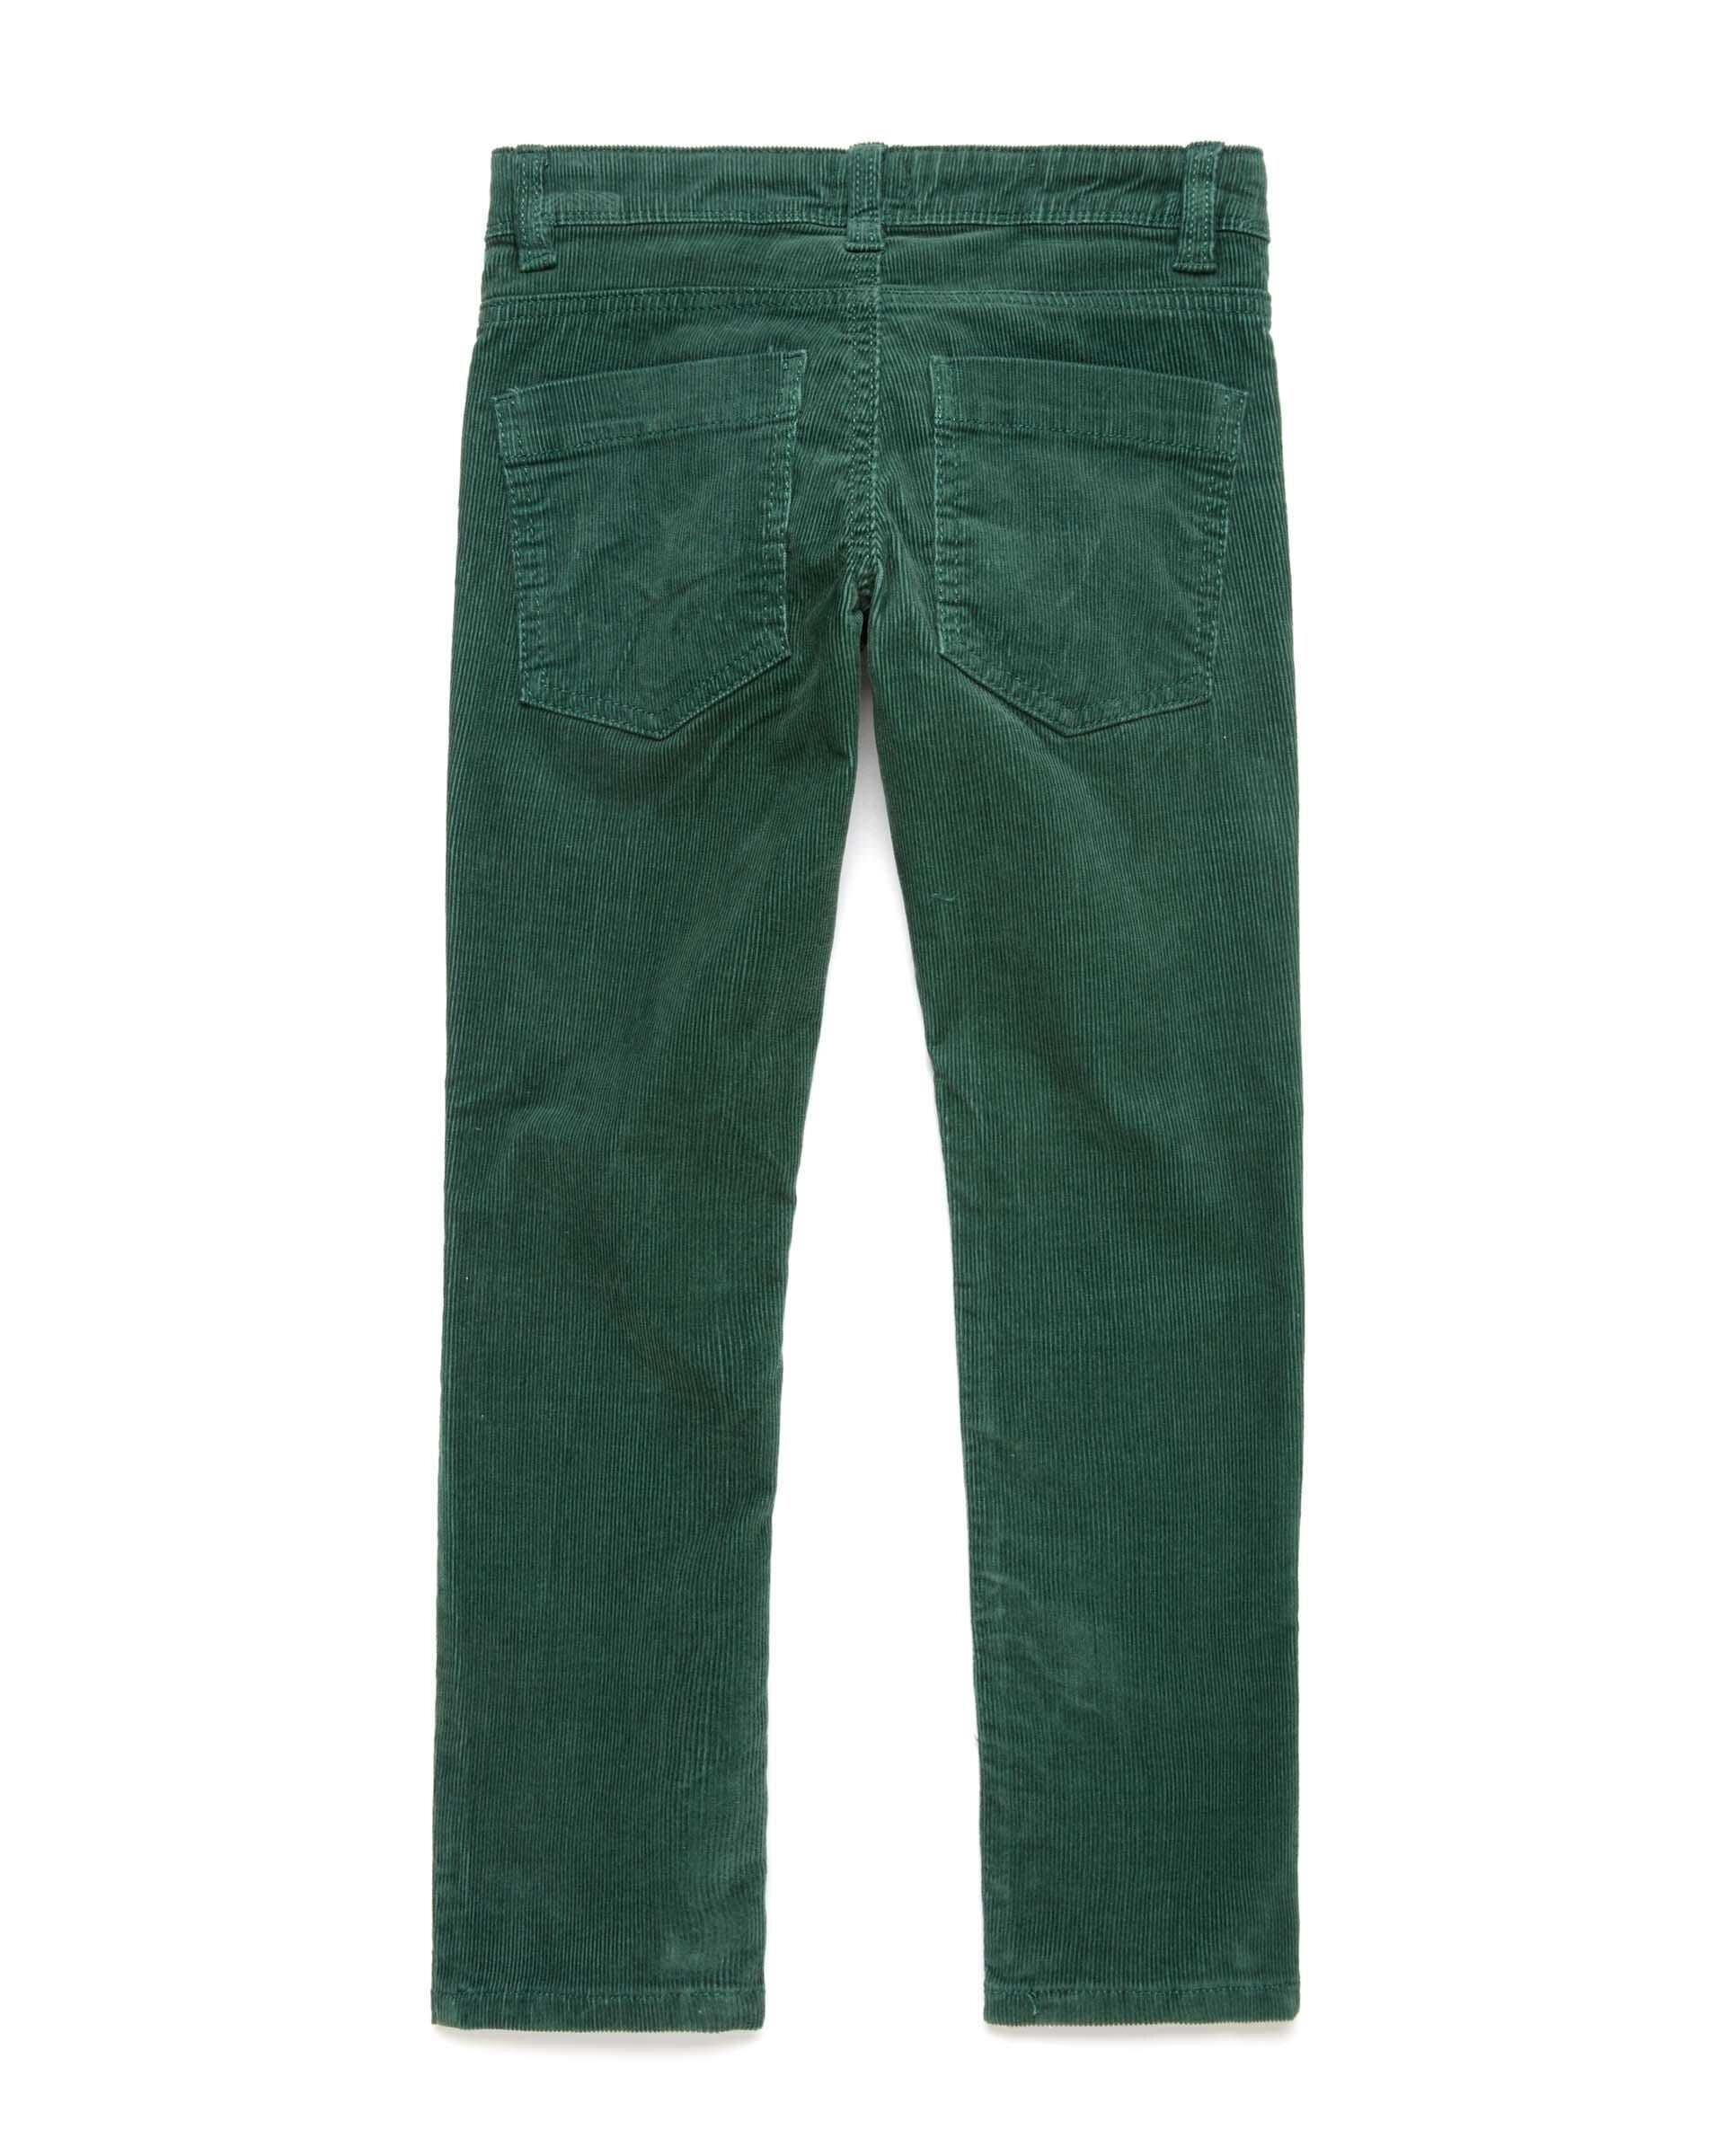 5 Cep Kadife Pantolon